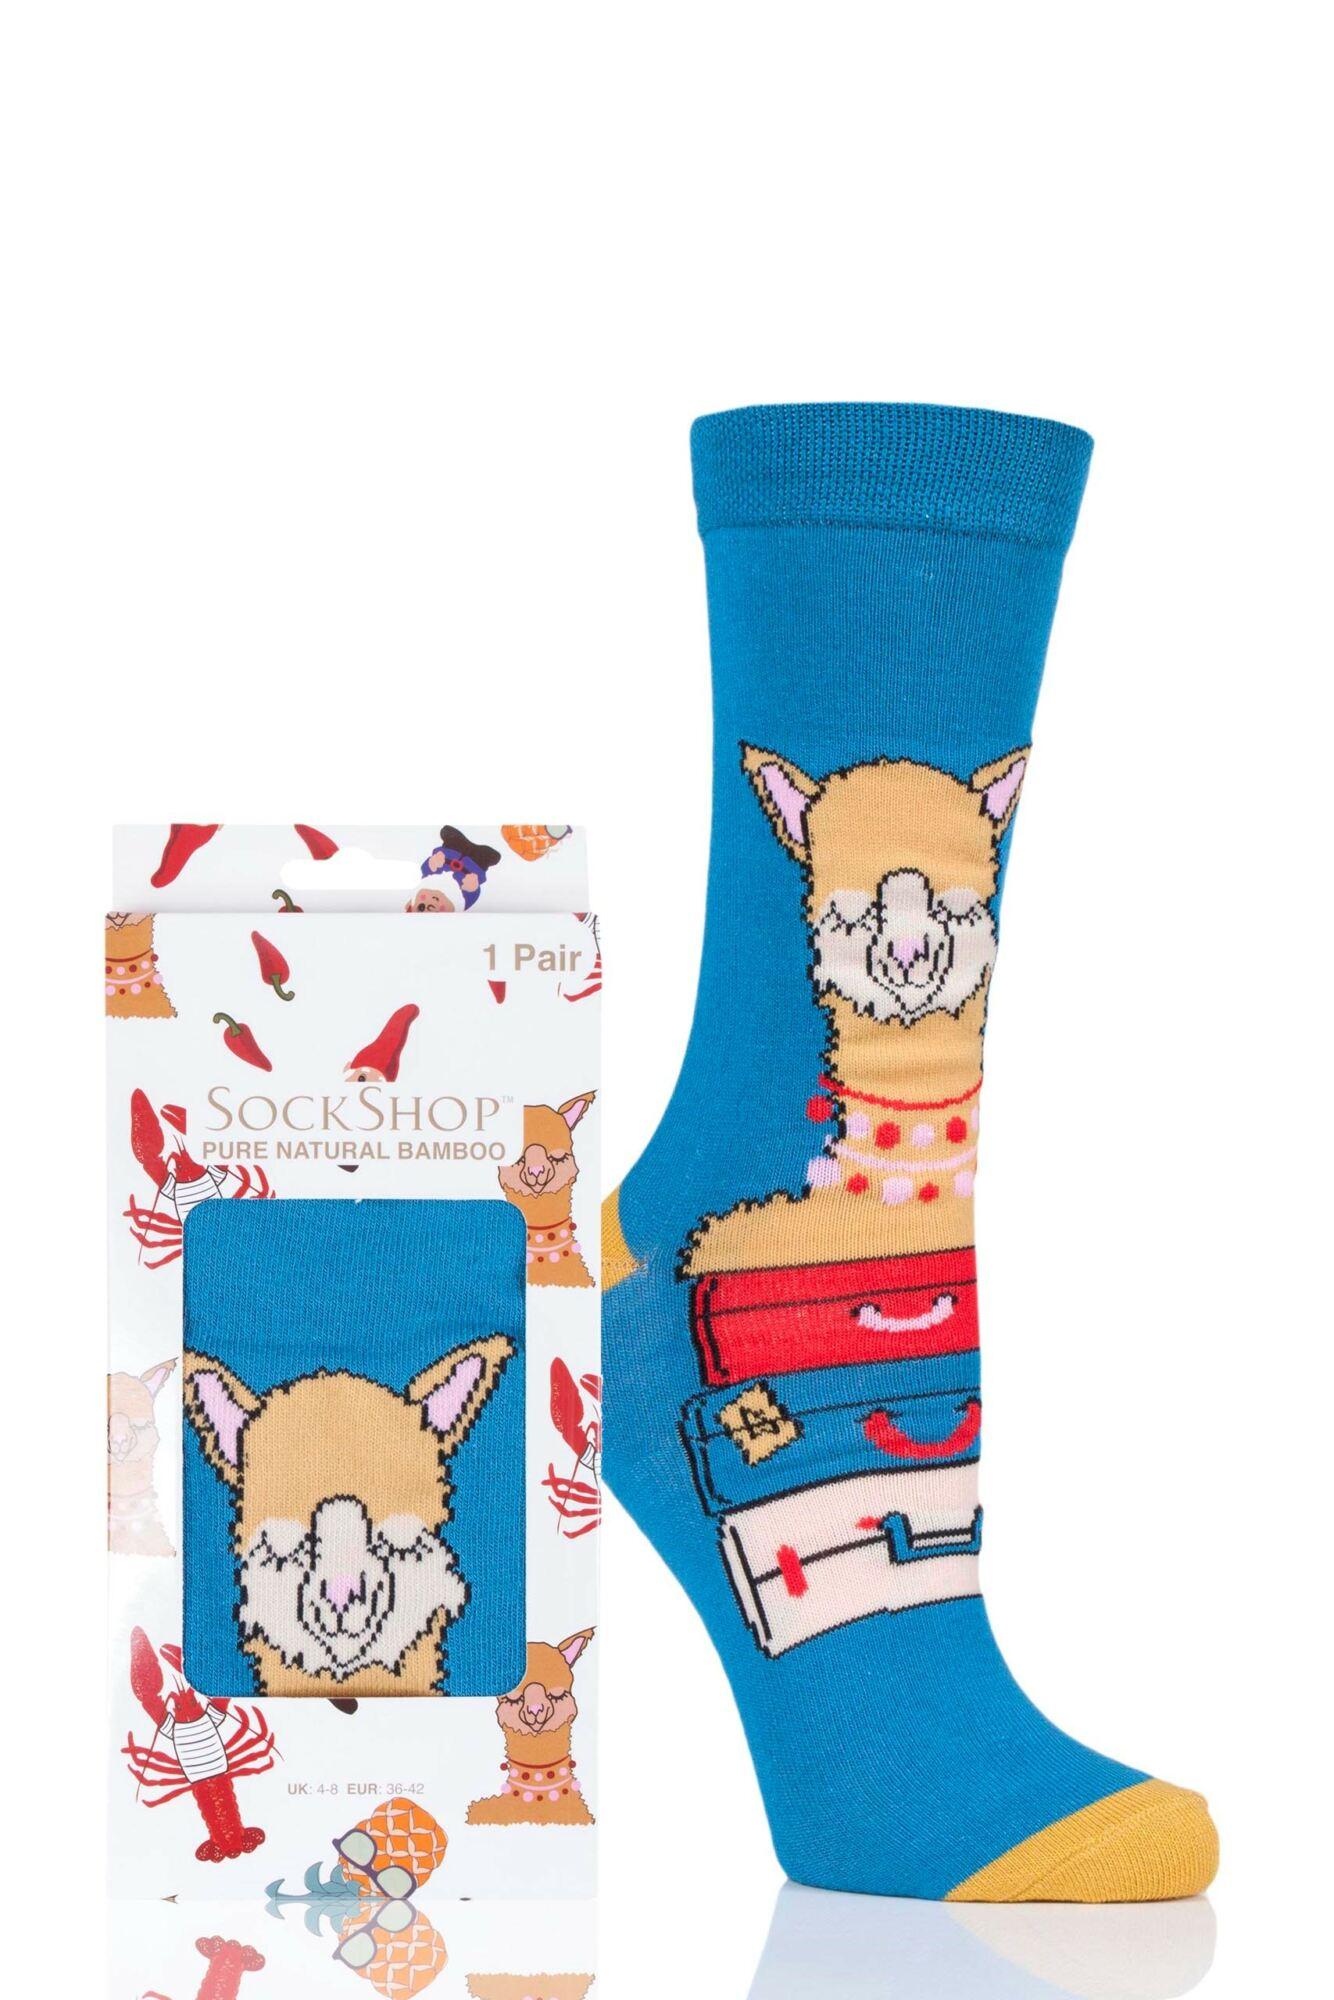 1 Pair Bamboo Alpaca My Bags Gift Boxed Socks Ladies - Lazy Panda